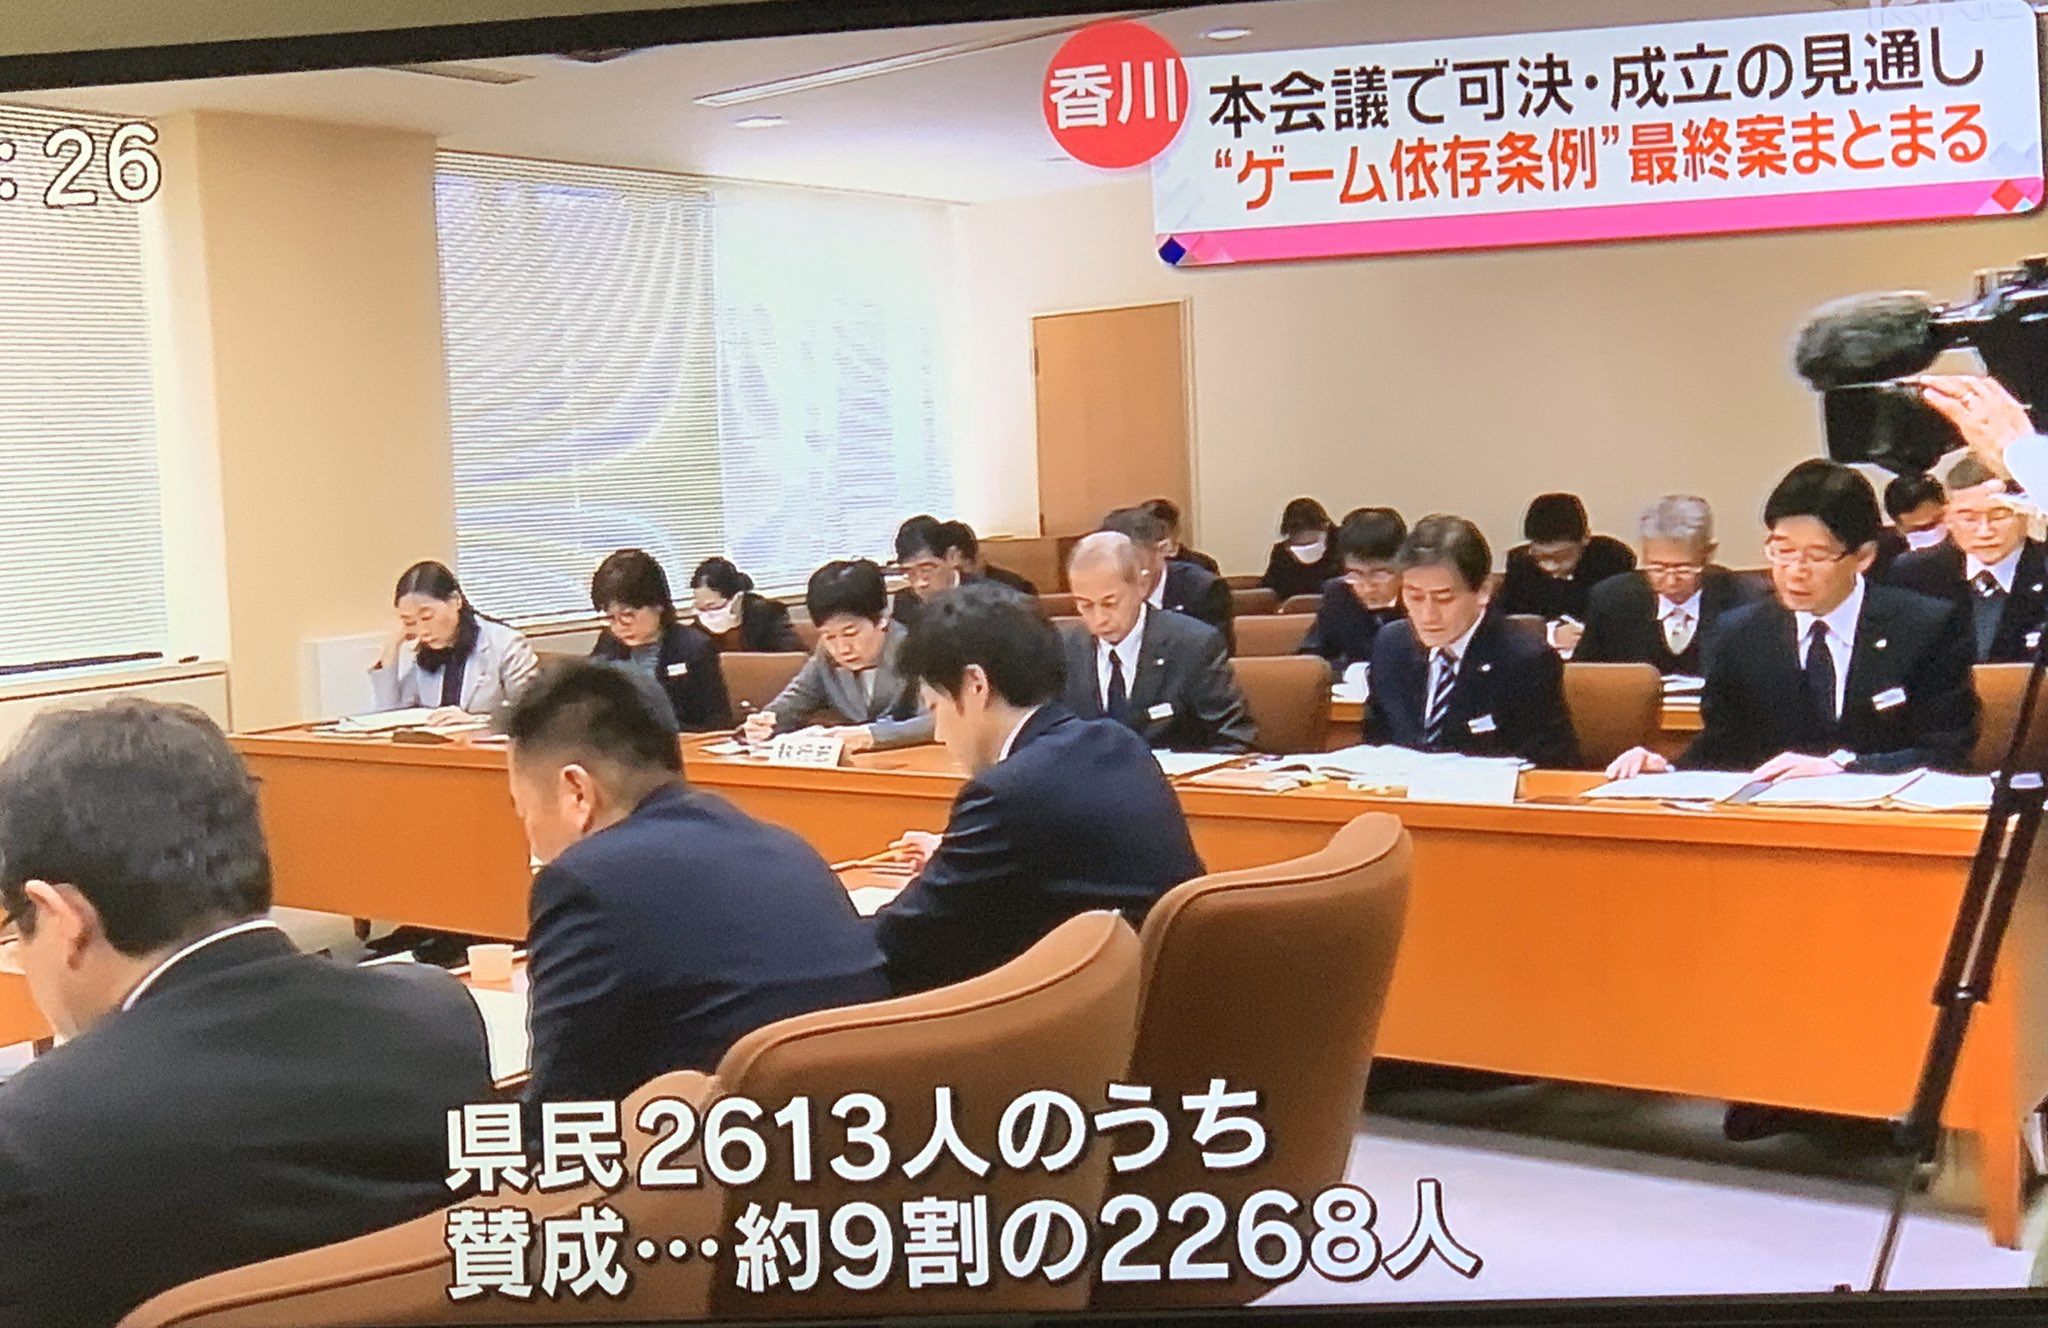 ckb7KmW - 【悲報】香川県さん、ゲーム規制条例で自演してた事がバレてしまい証拠隠滅し始める